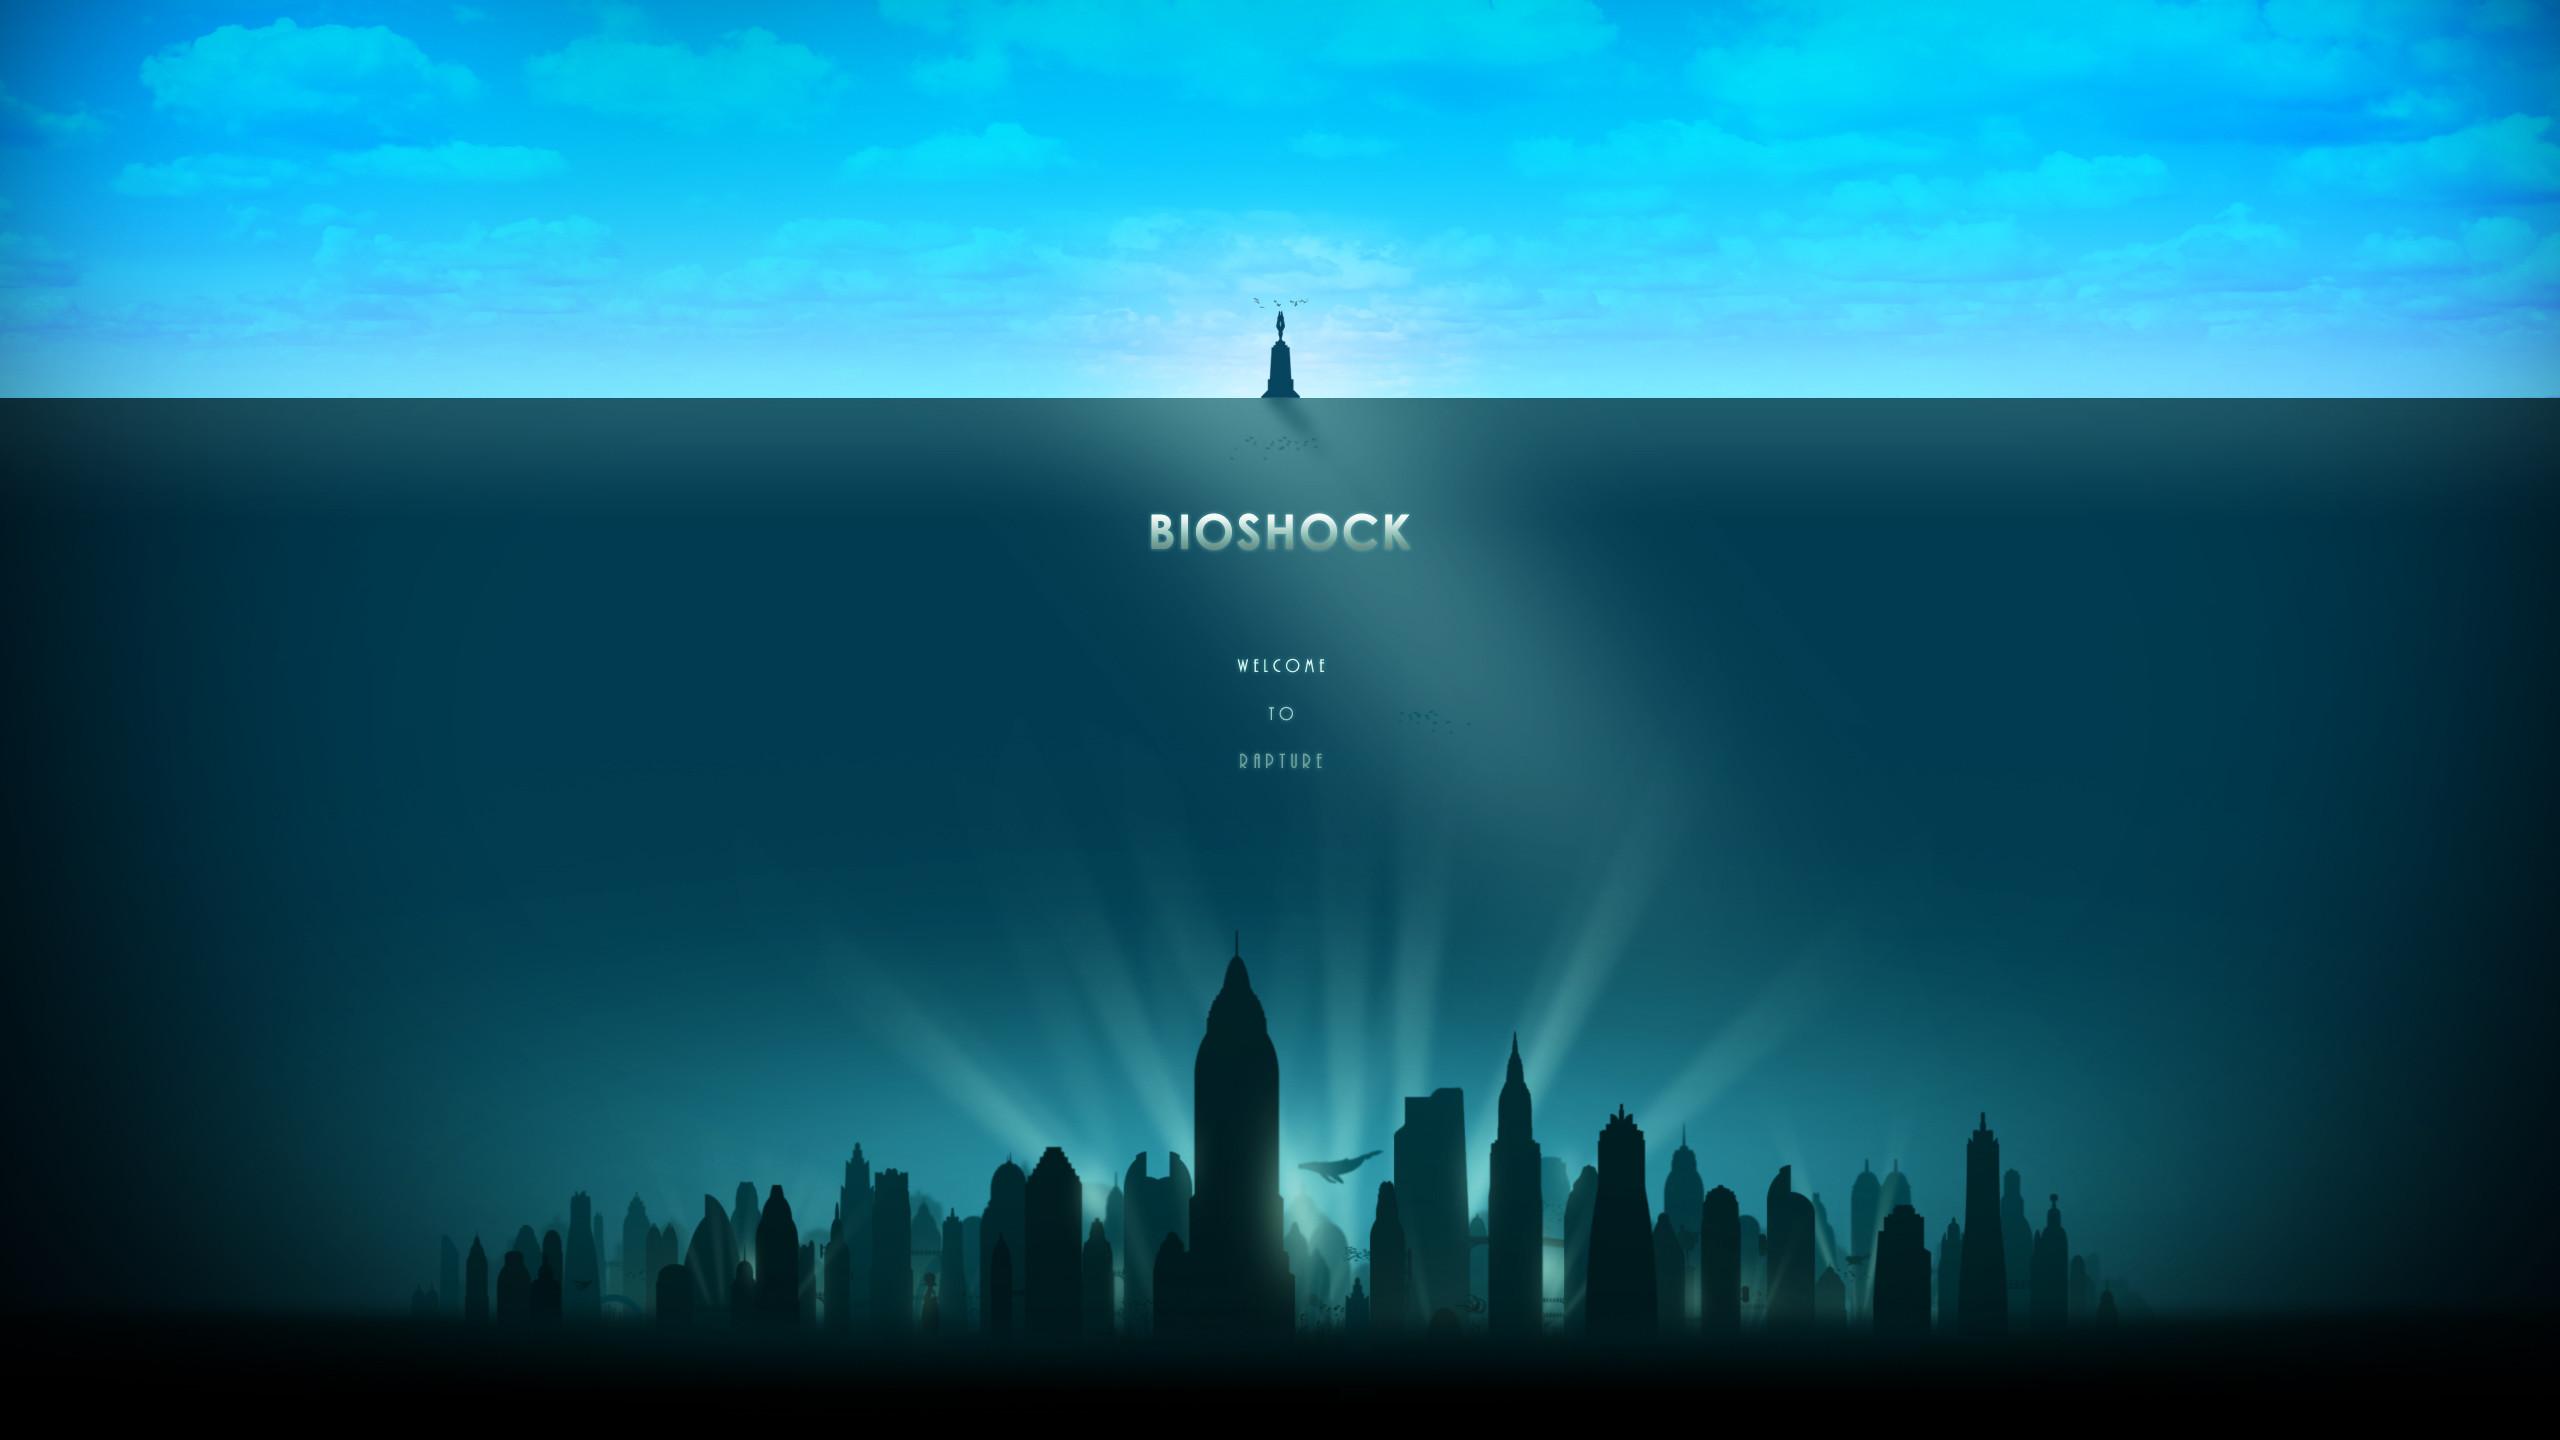 Bioshock-Welcome_to_Rapture.jpg …